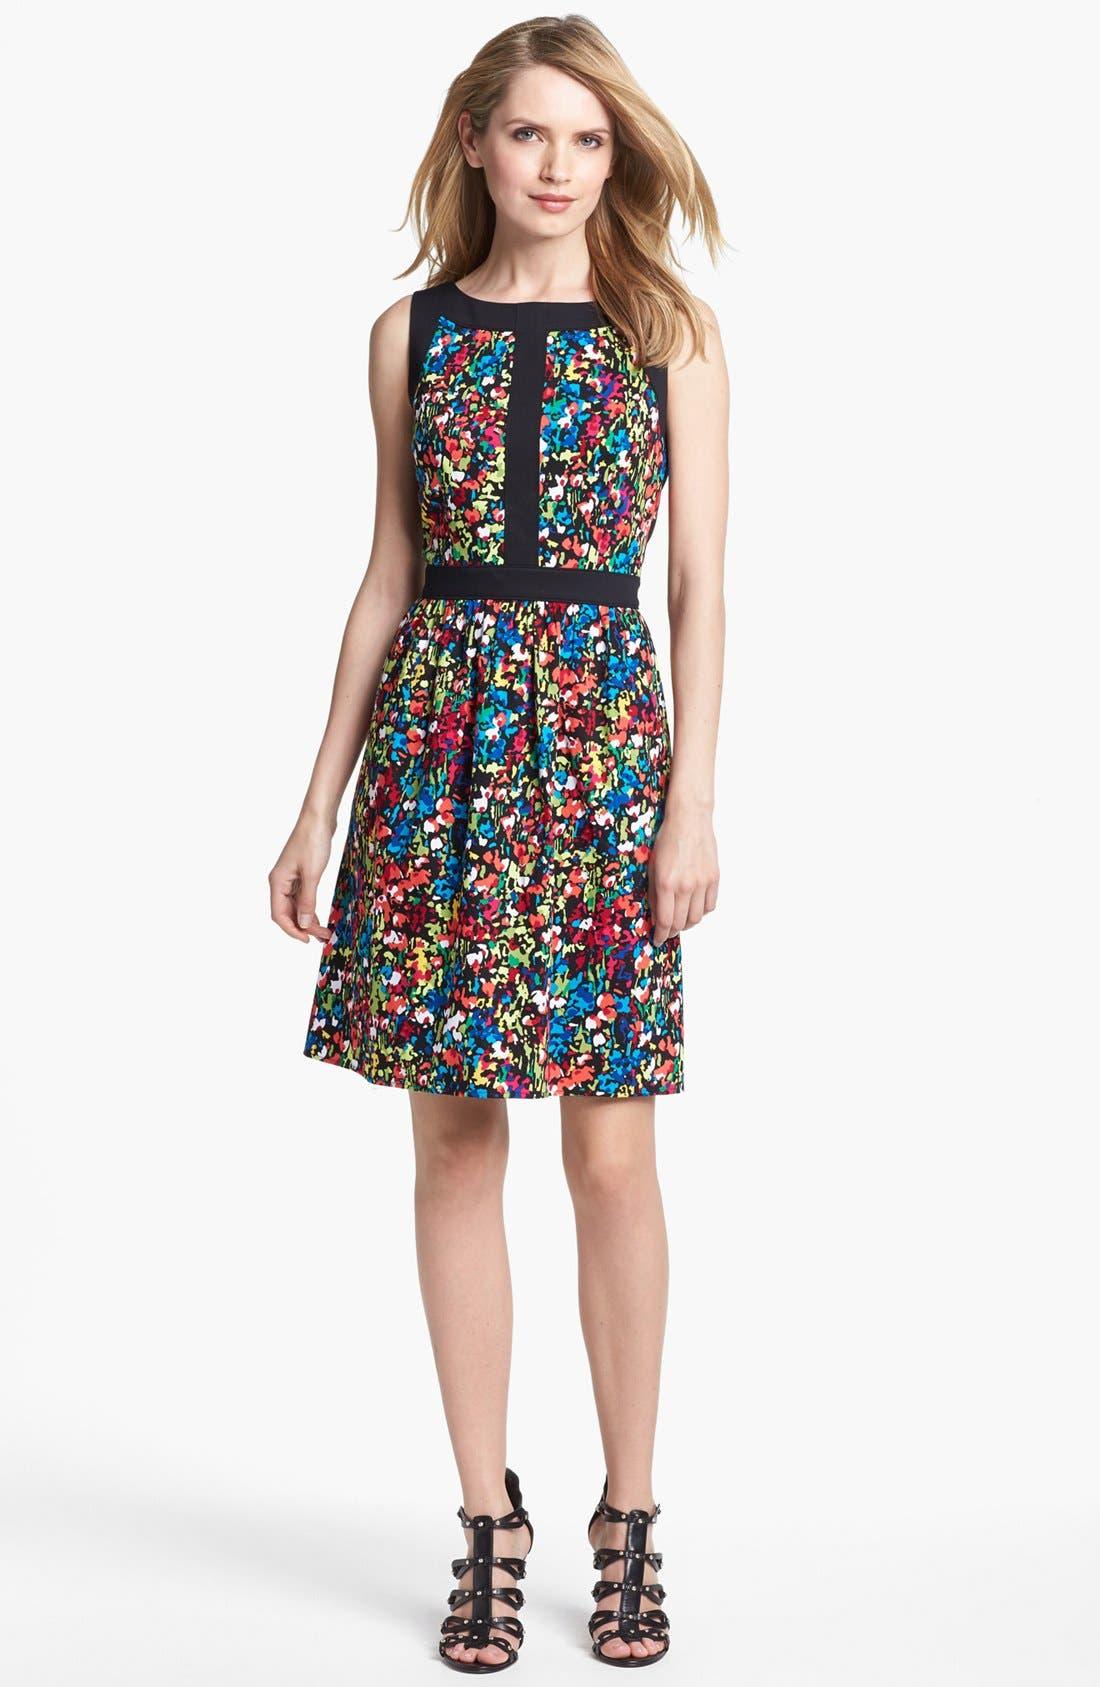 Alternate Image 1 Selected - Ellen Tracy Floral Print Fit & Flare Dress